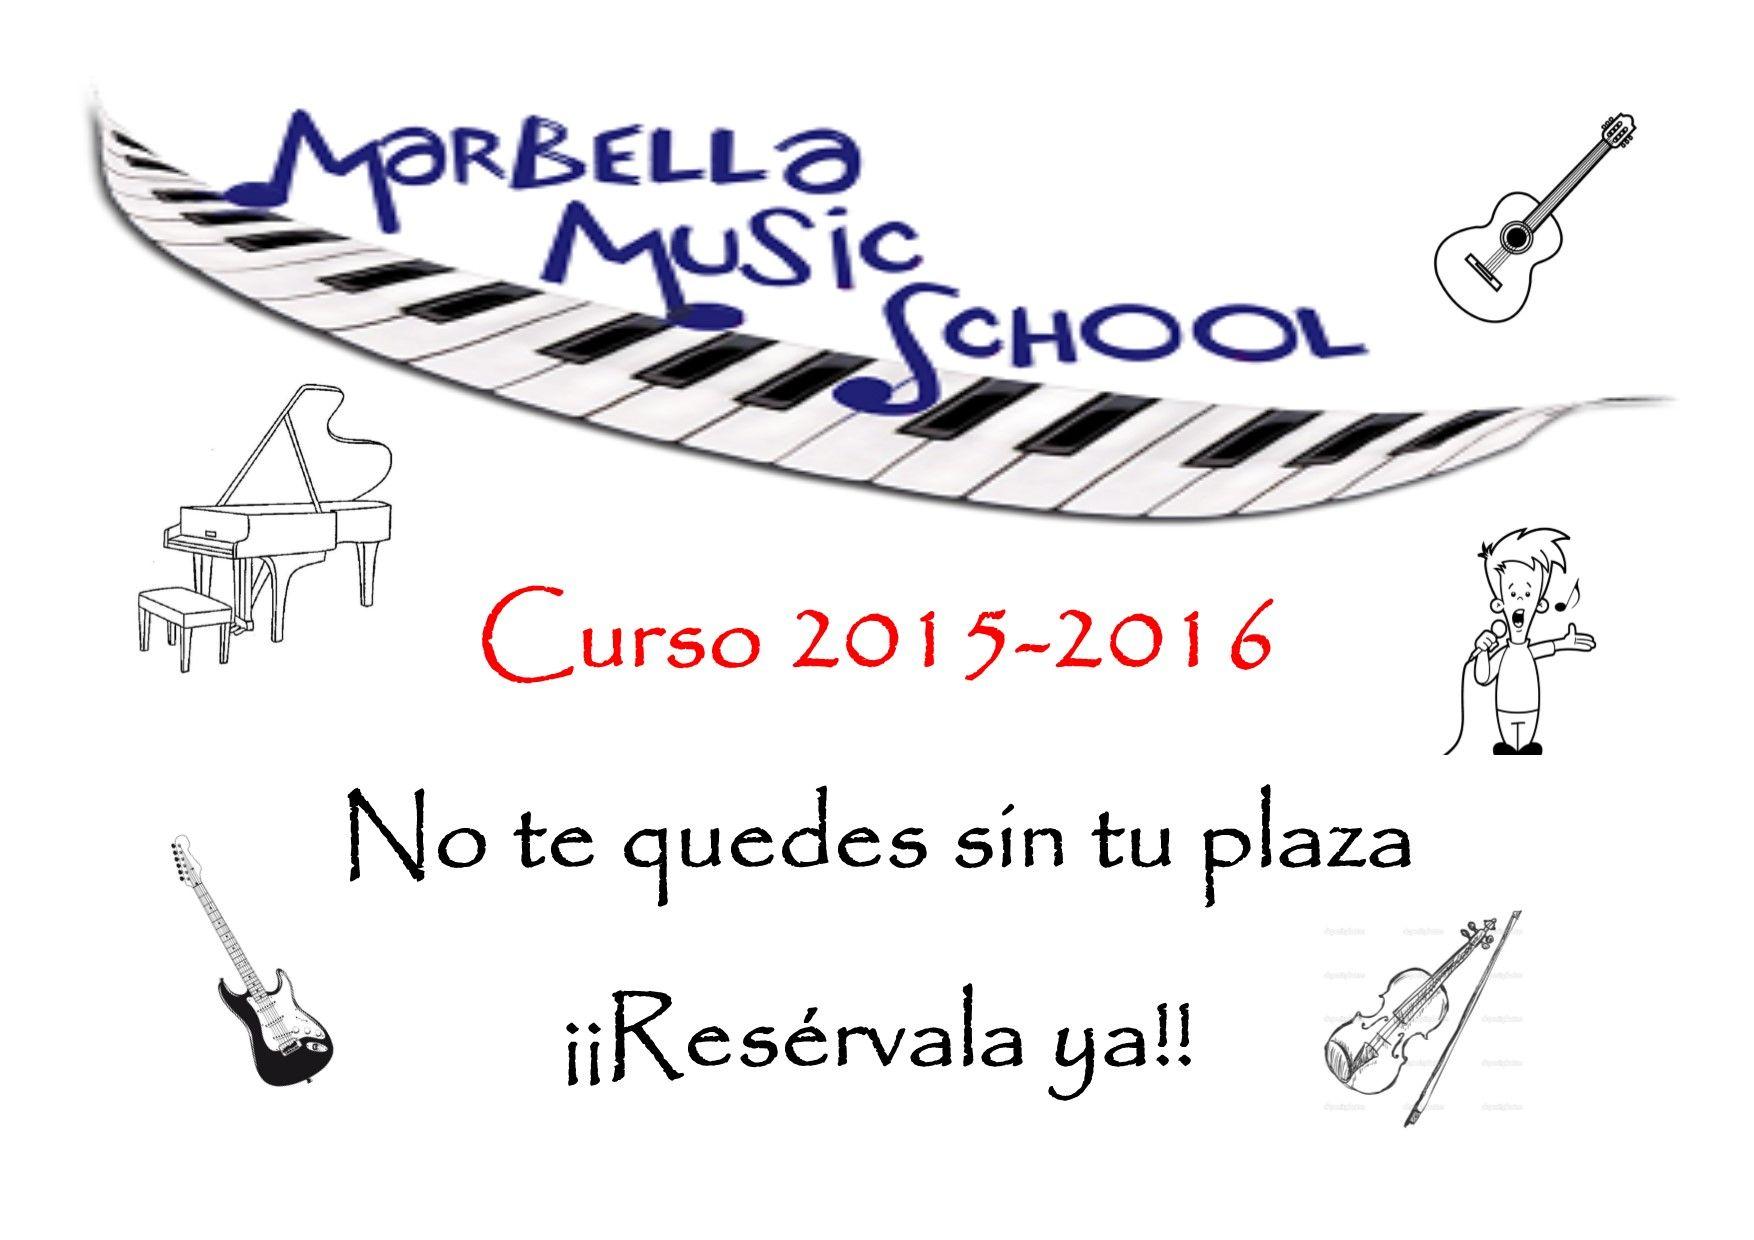 Reserva ya tu plaza para el curso 2015/2016